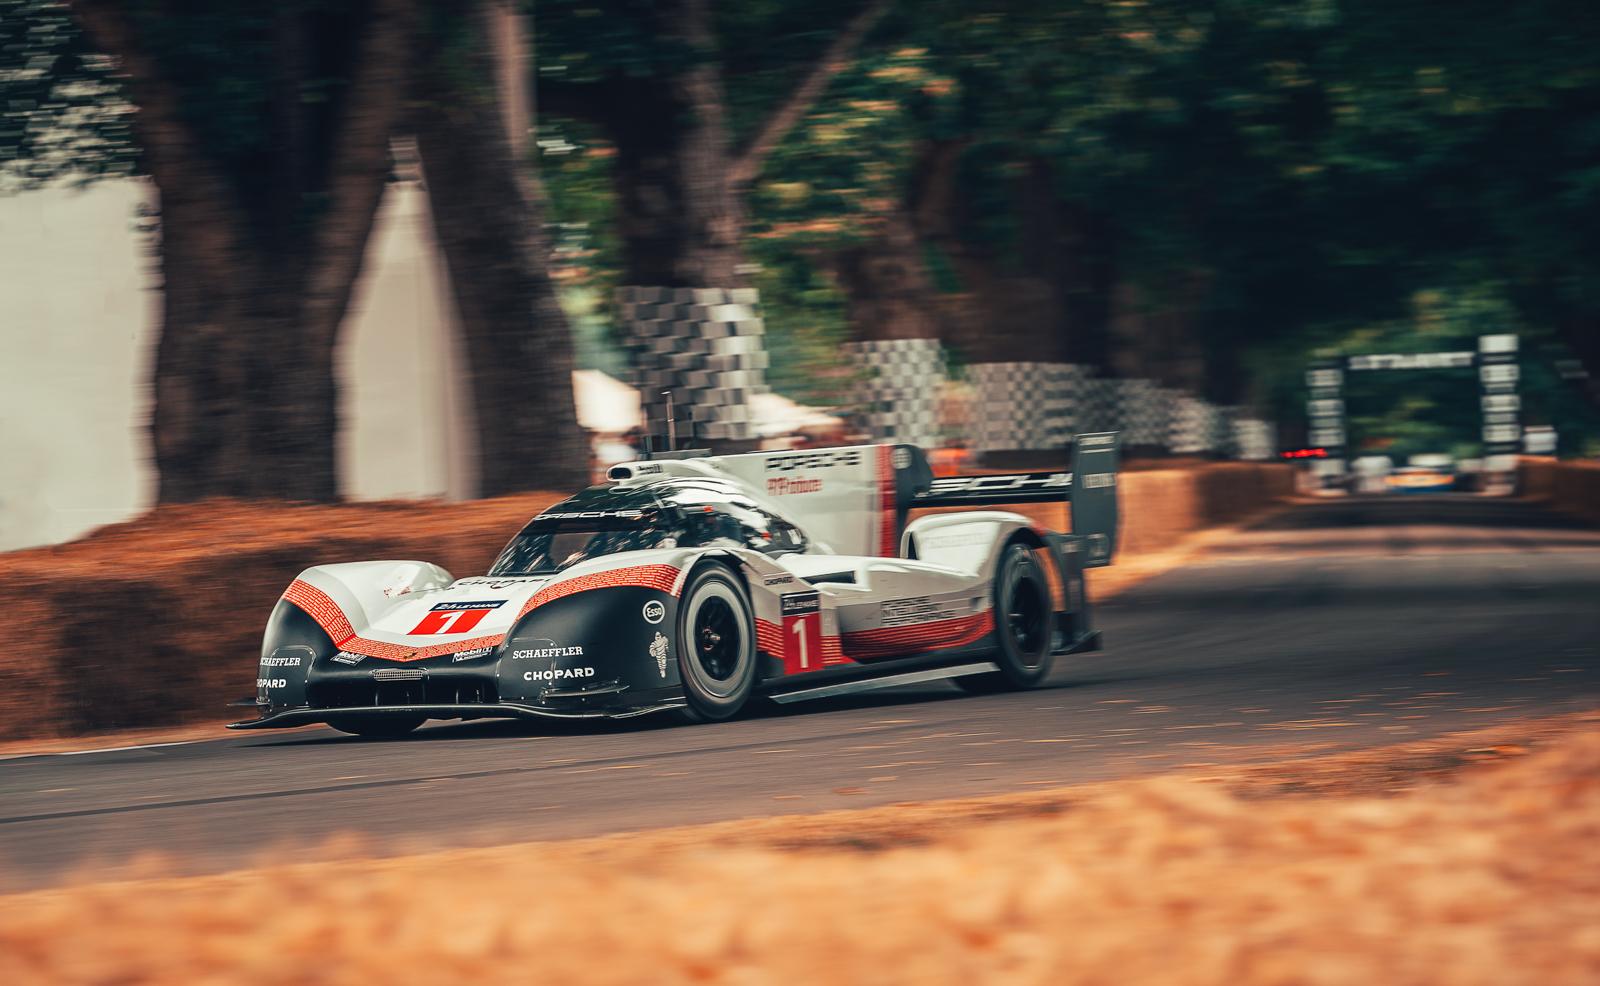 RP - Porsche Goodwood Fesitval of Speed 70 Years 2018-33.jpg